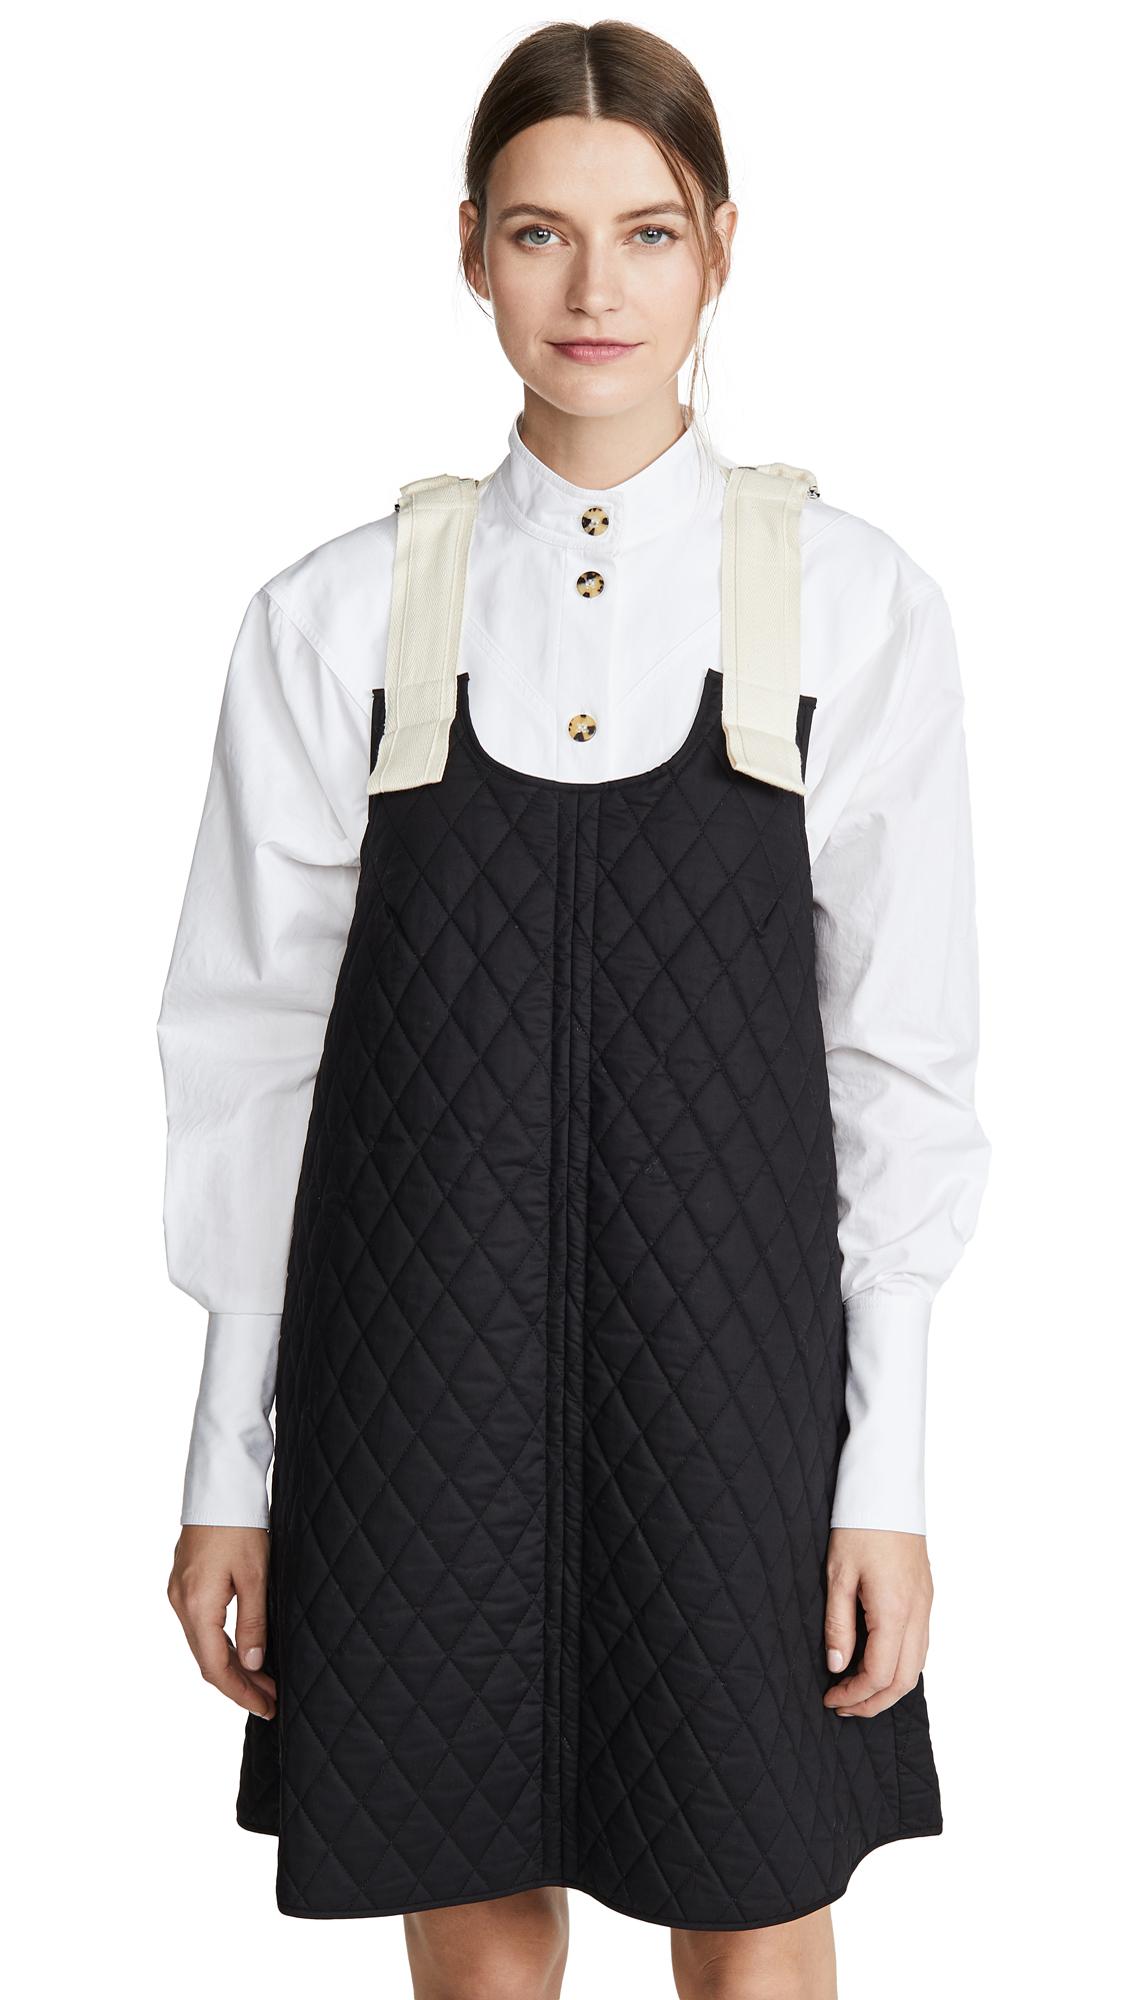 Lee Mathews Dresses OLIVE QUILTED APRON DRESS